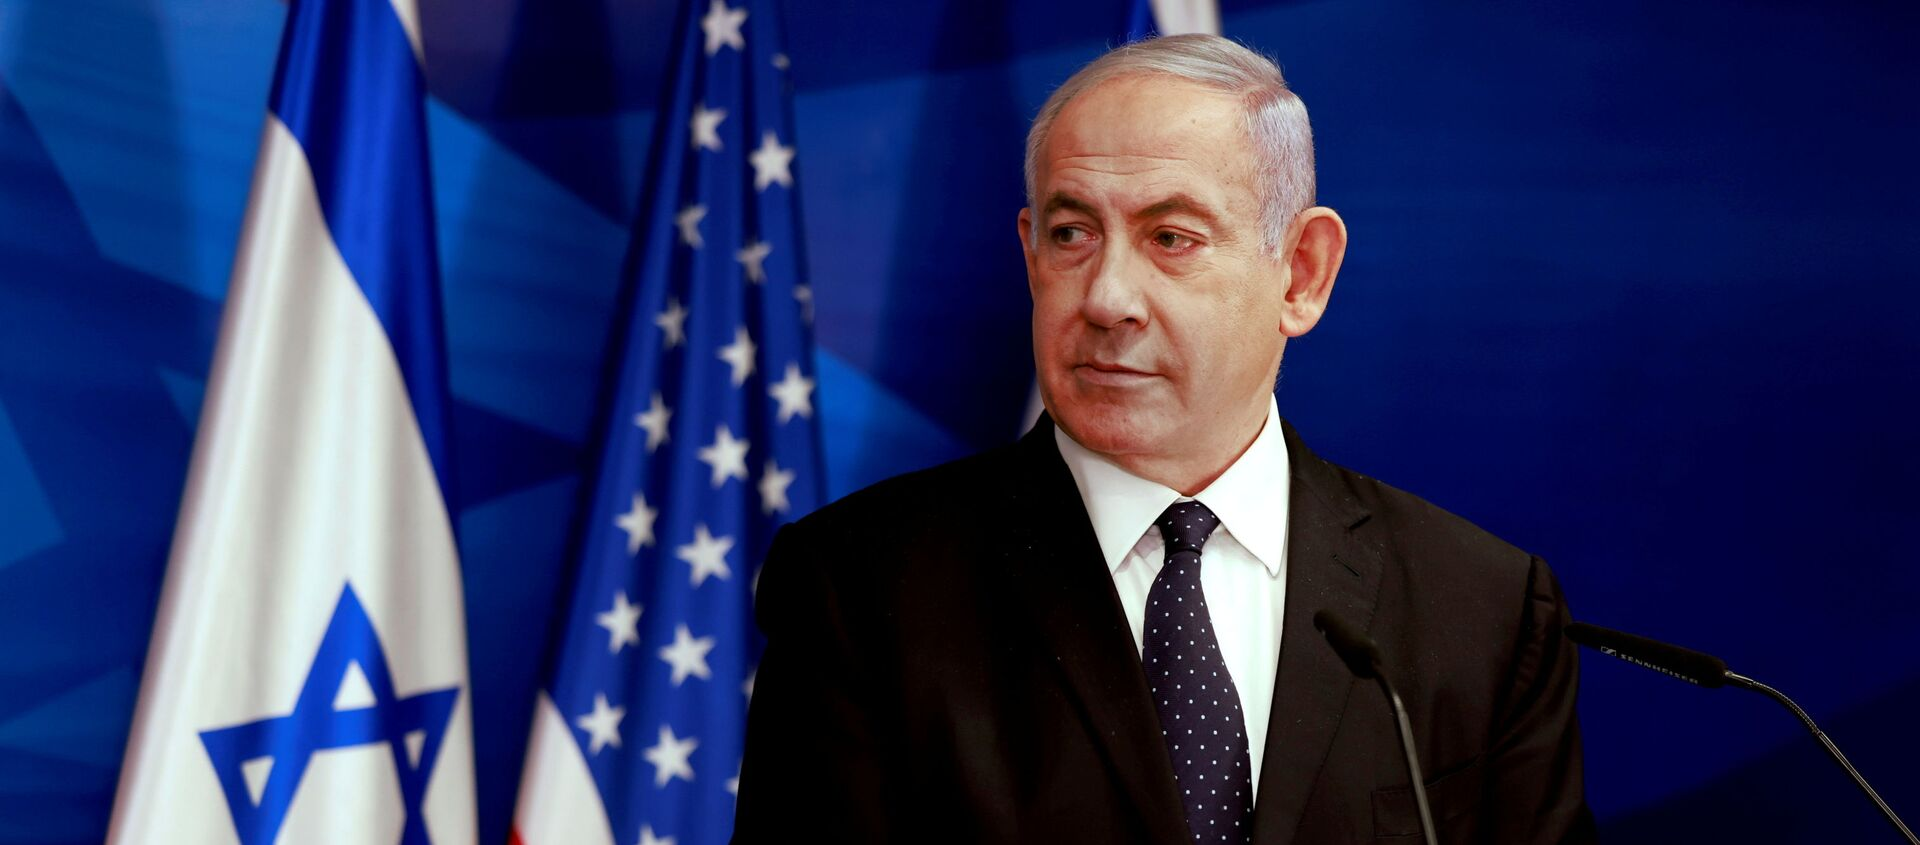 Israeli Prime Minister Benjamin Netanyahu looks at U.S. Secretary of State Antony Blinken (not pictured) during a joint news conference in Jerusalem, May 25, 2021. - Sputnik International, 1920, 01.06.2021